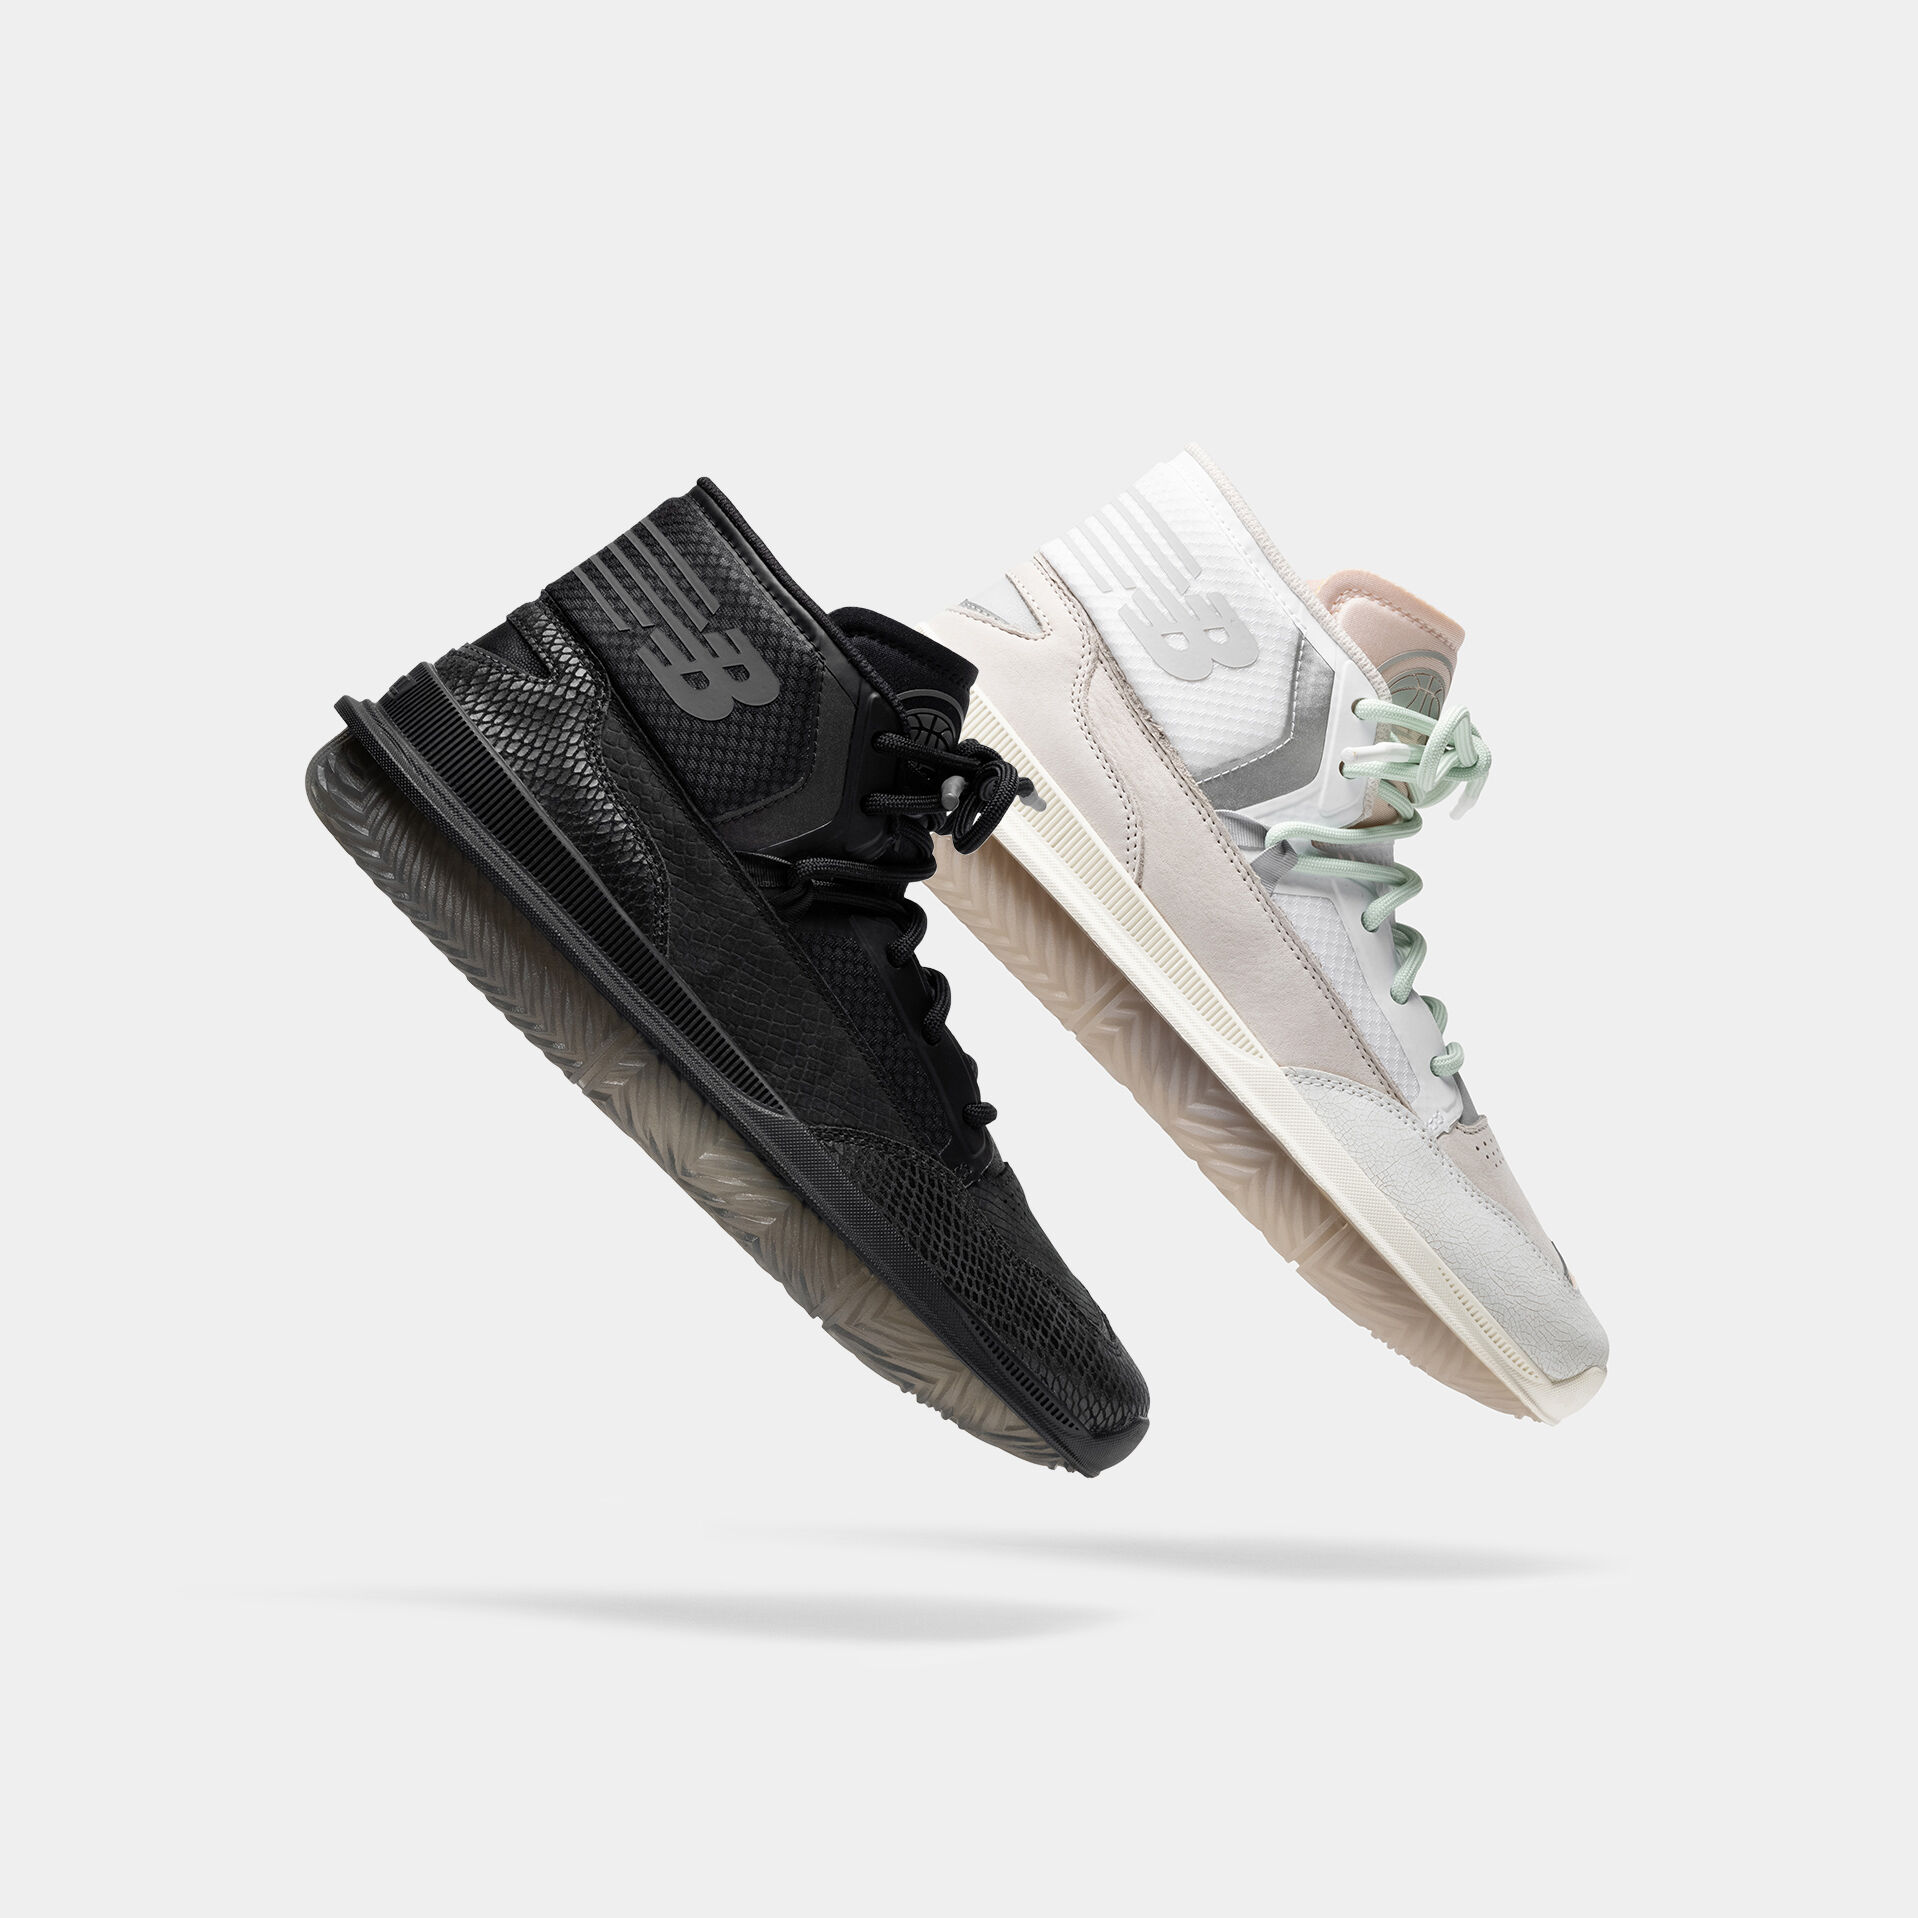 Basketball Sneakers & Apparel - New Balance